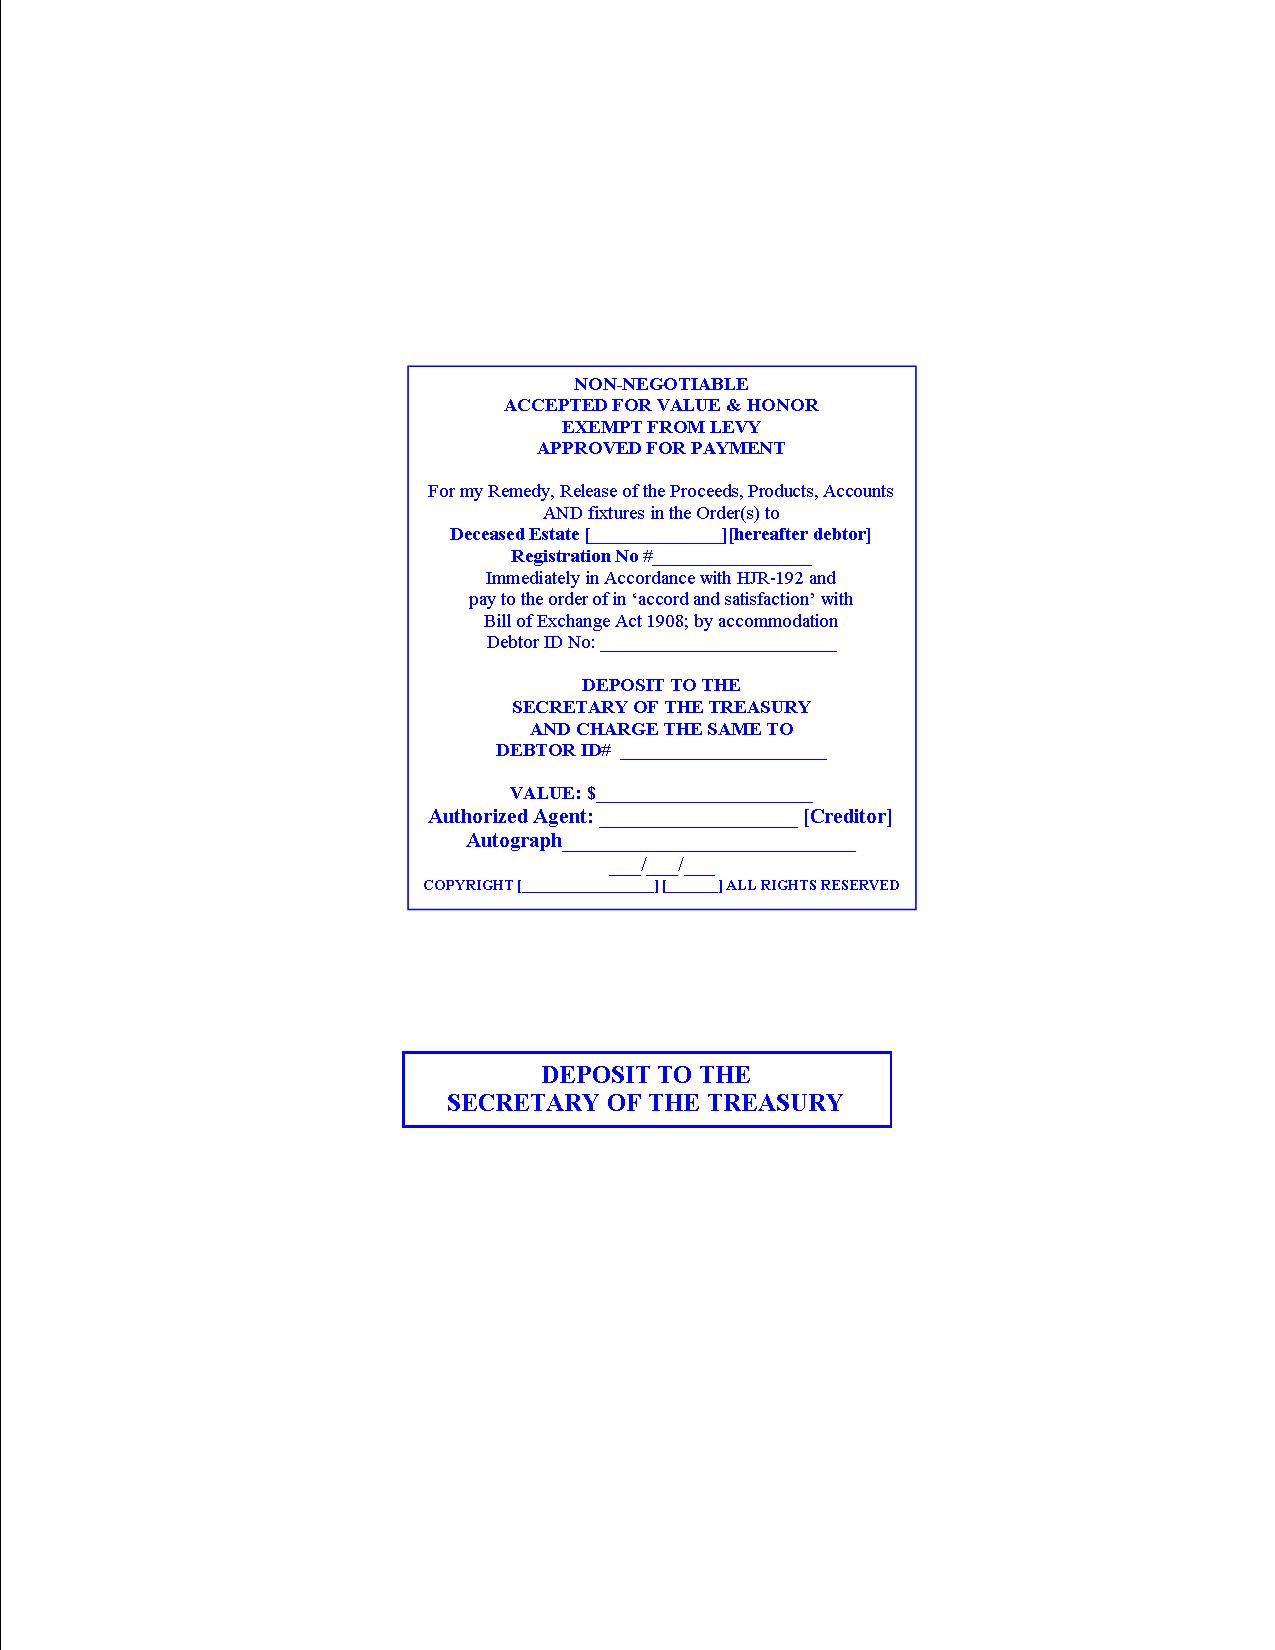 Death certificate template word death certificate letter sample free online fojtegvw xflitez Image collections